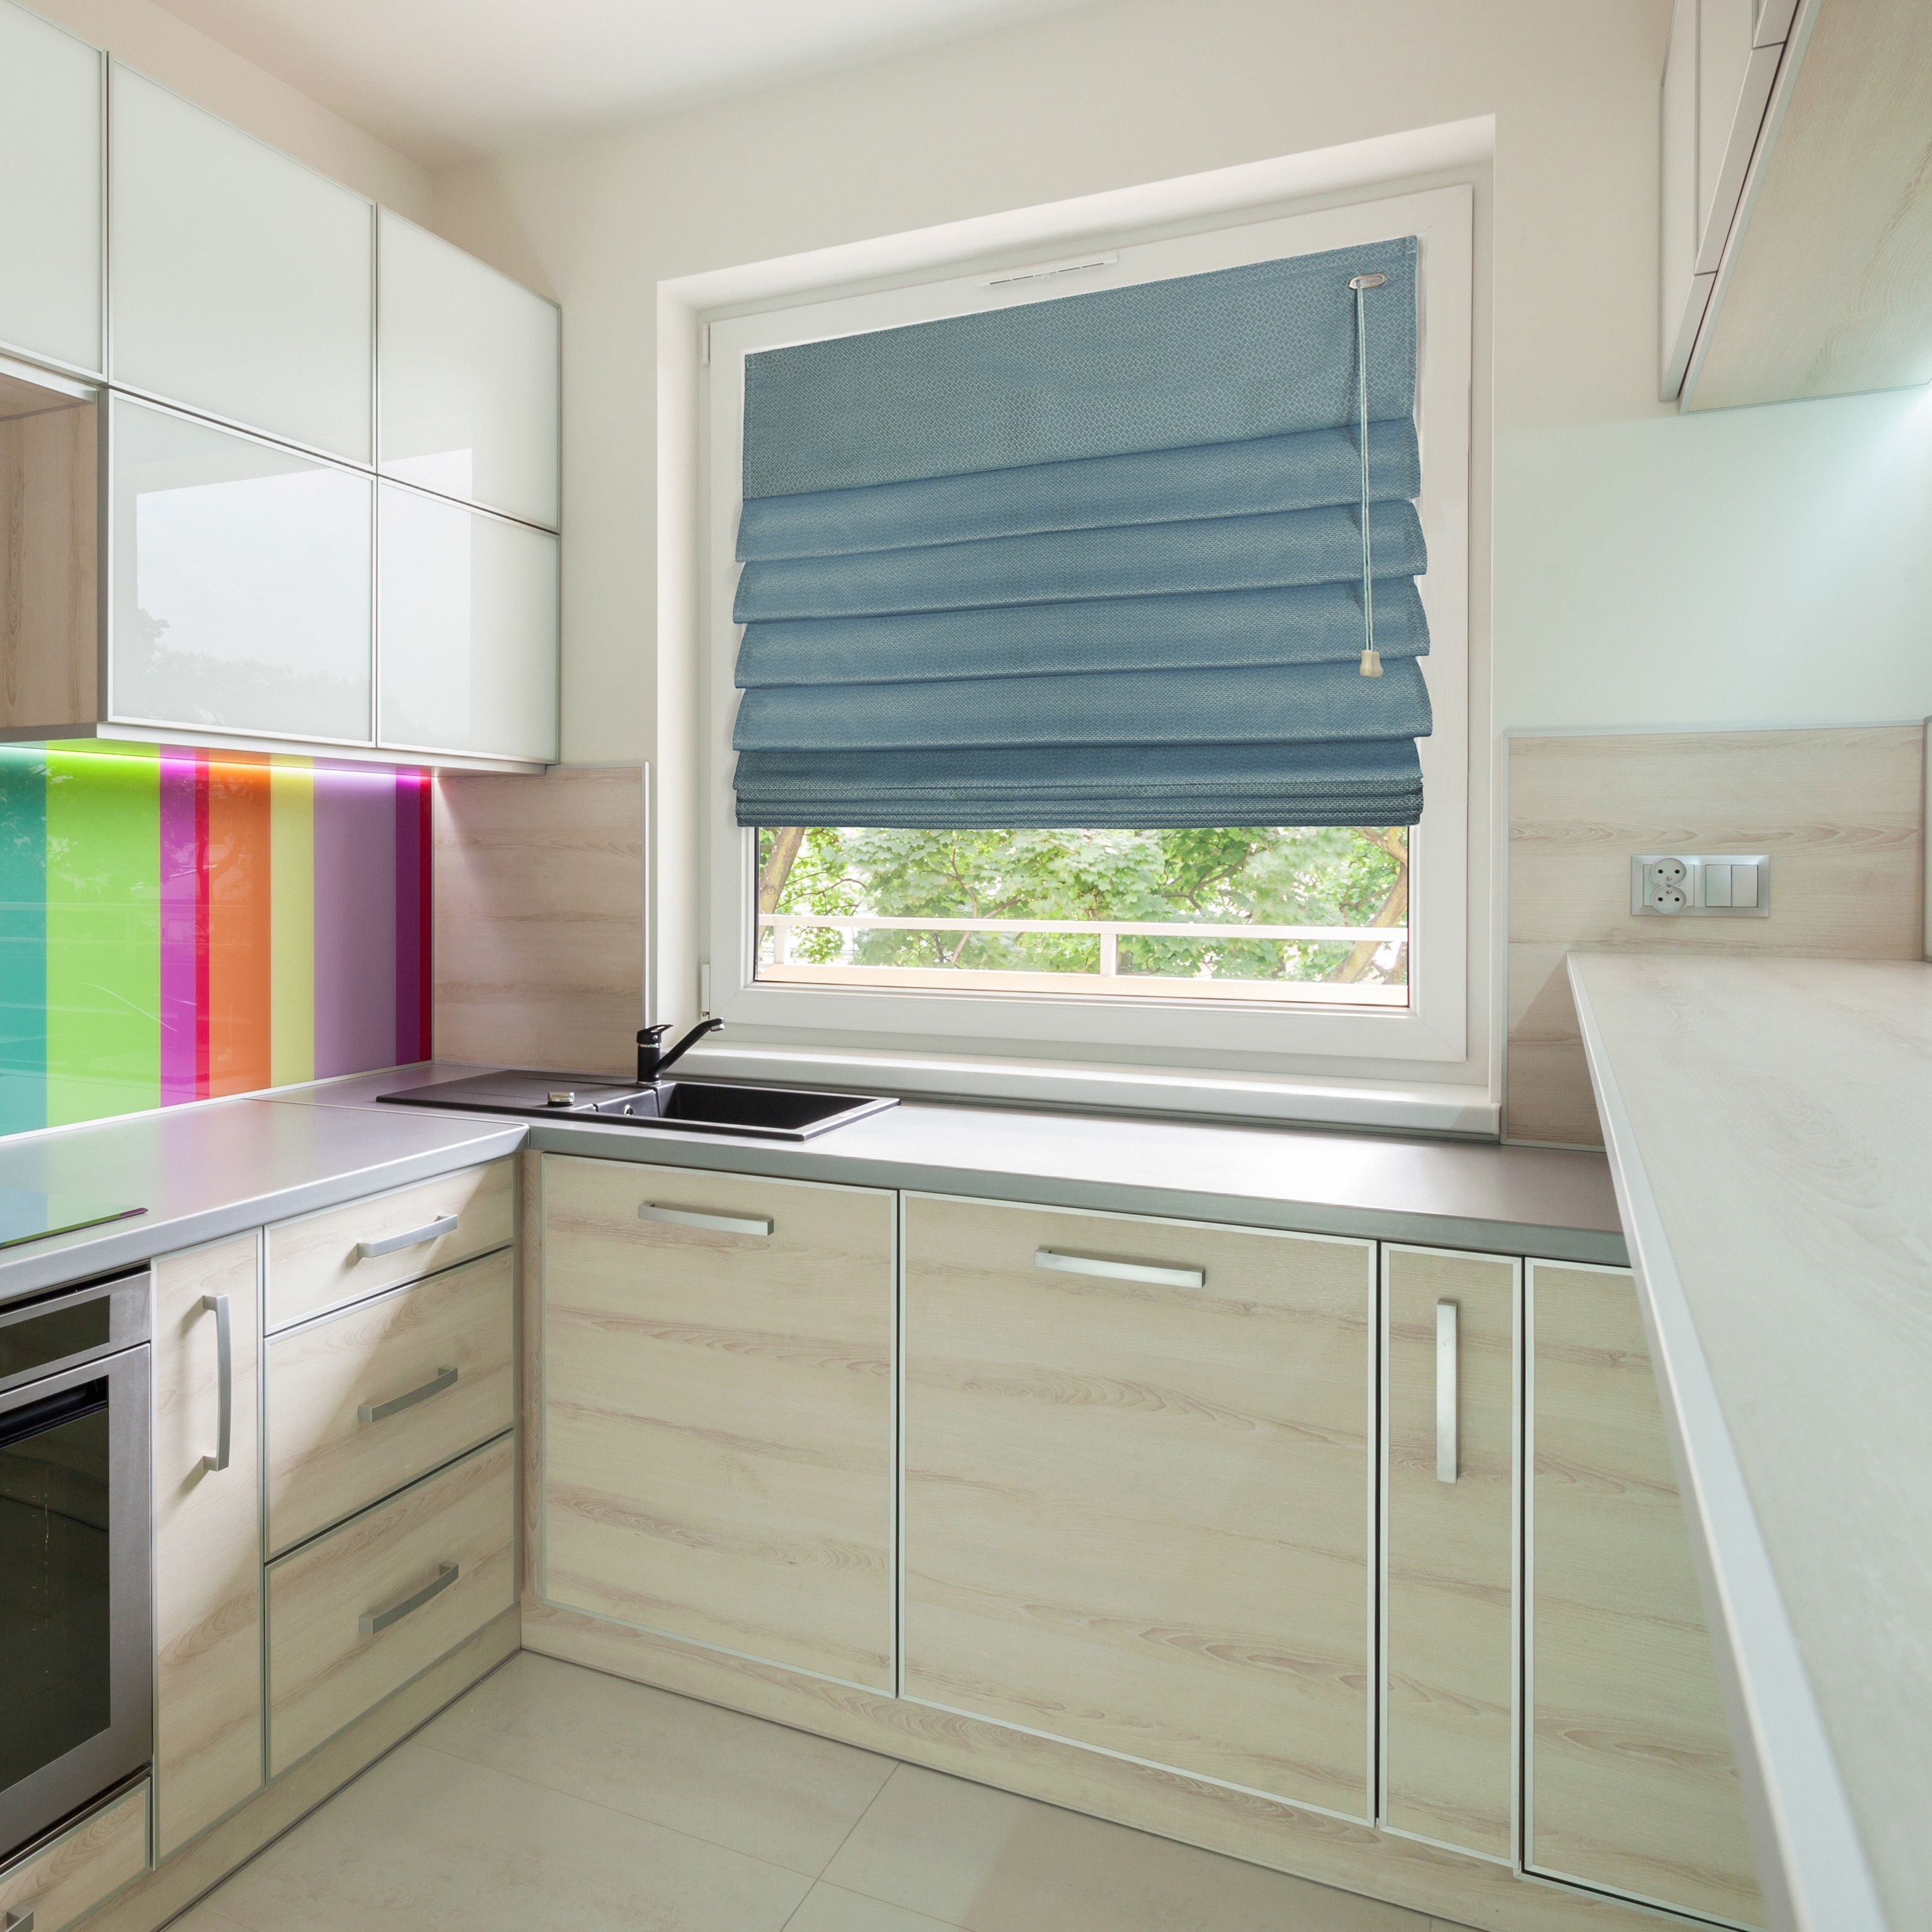 Kitchen window roman blinds  lewis hyman fabric thermal roman shade in  soft roman shades